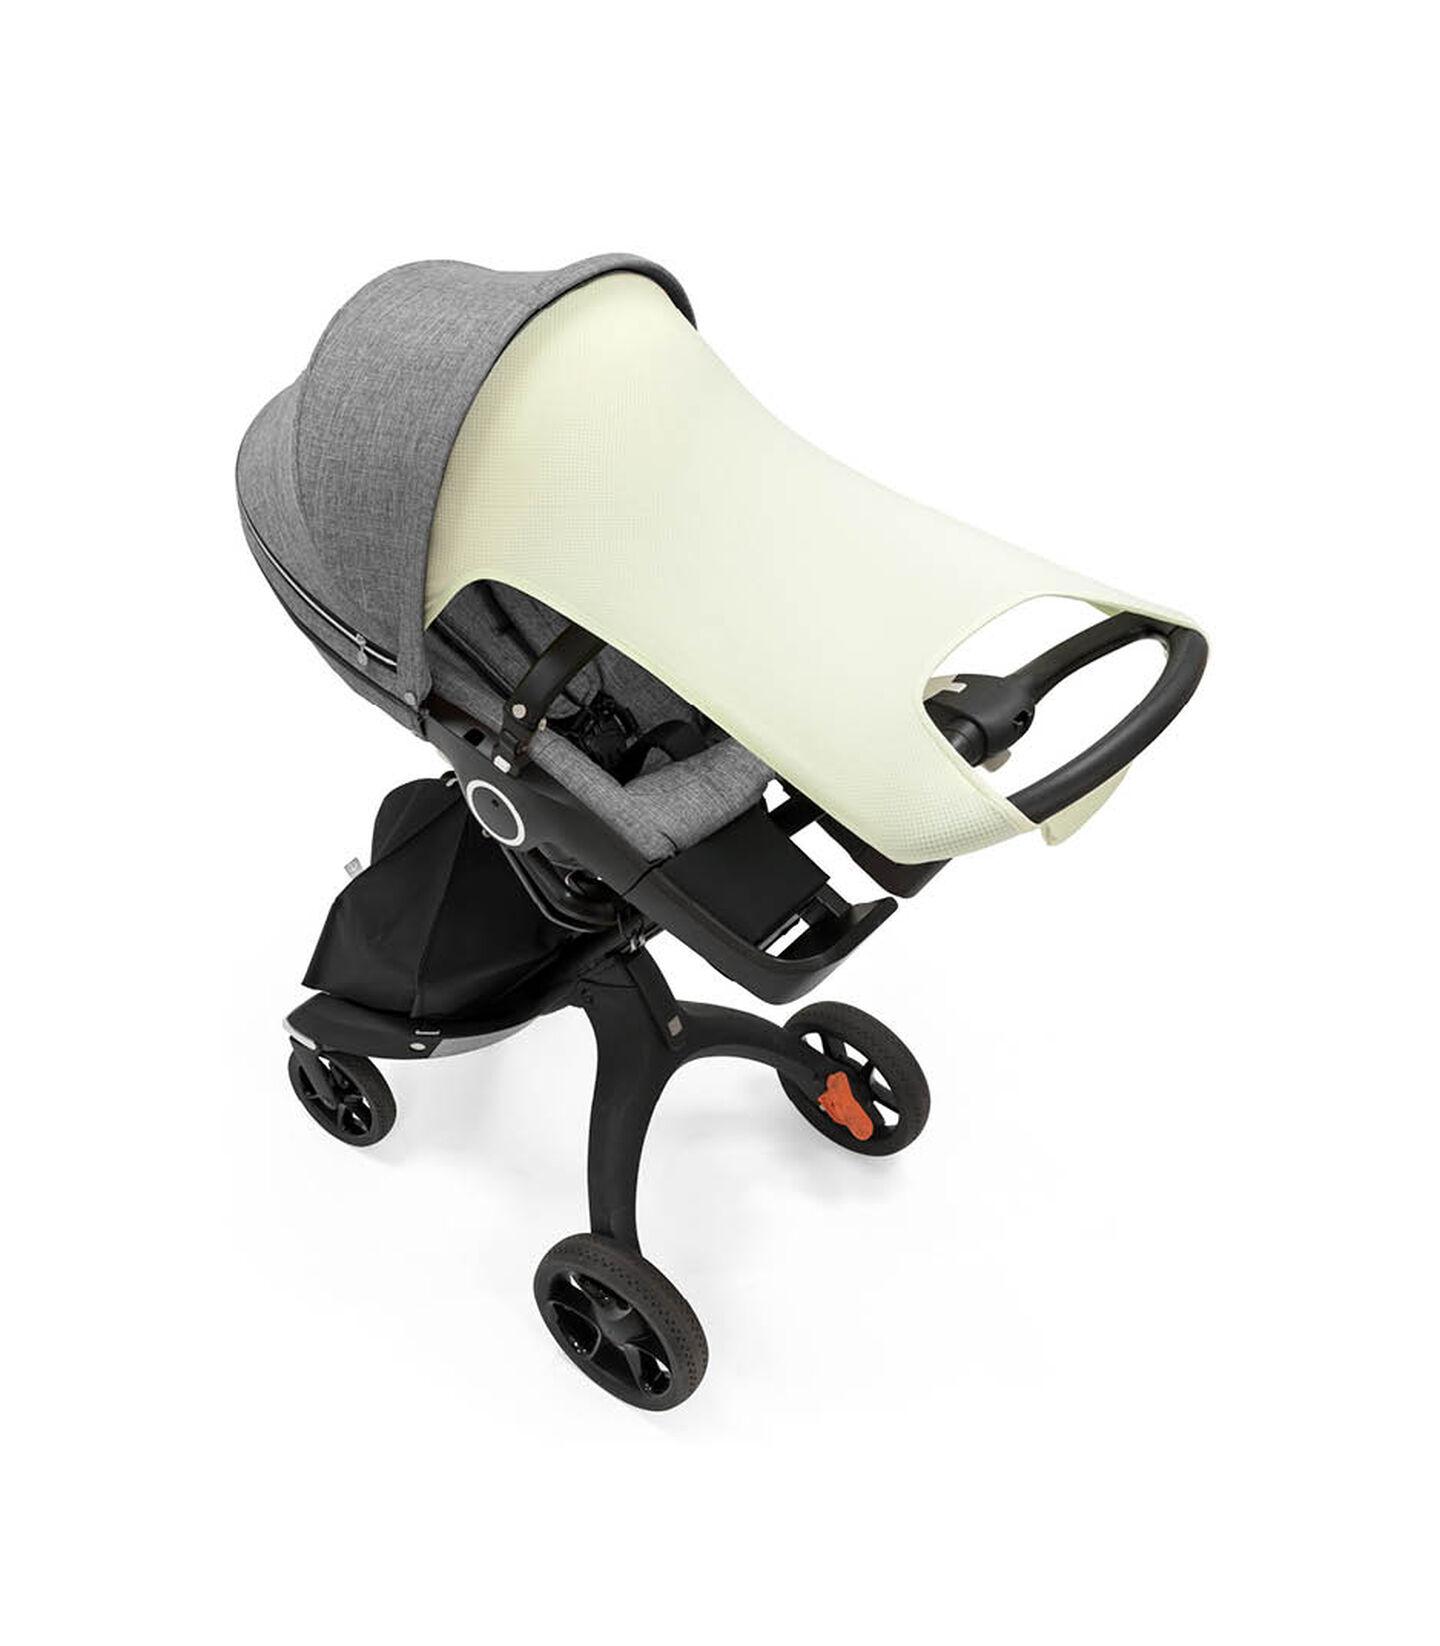 Stokke® Stroller Sun Shade Light Pistachio, Pistachio, mainview